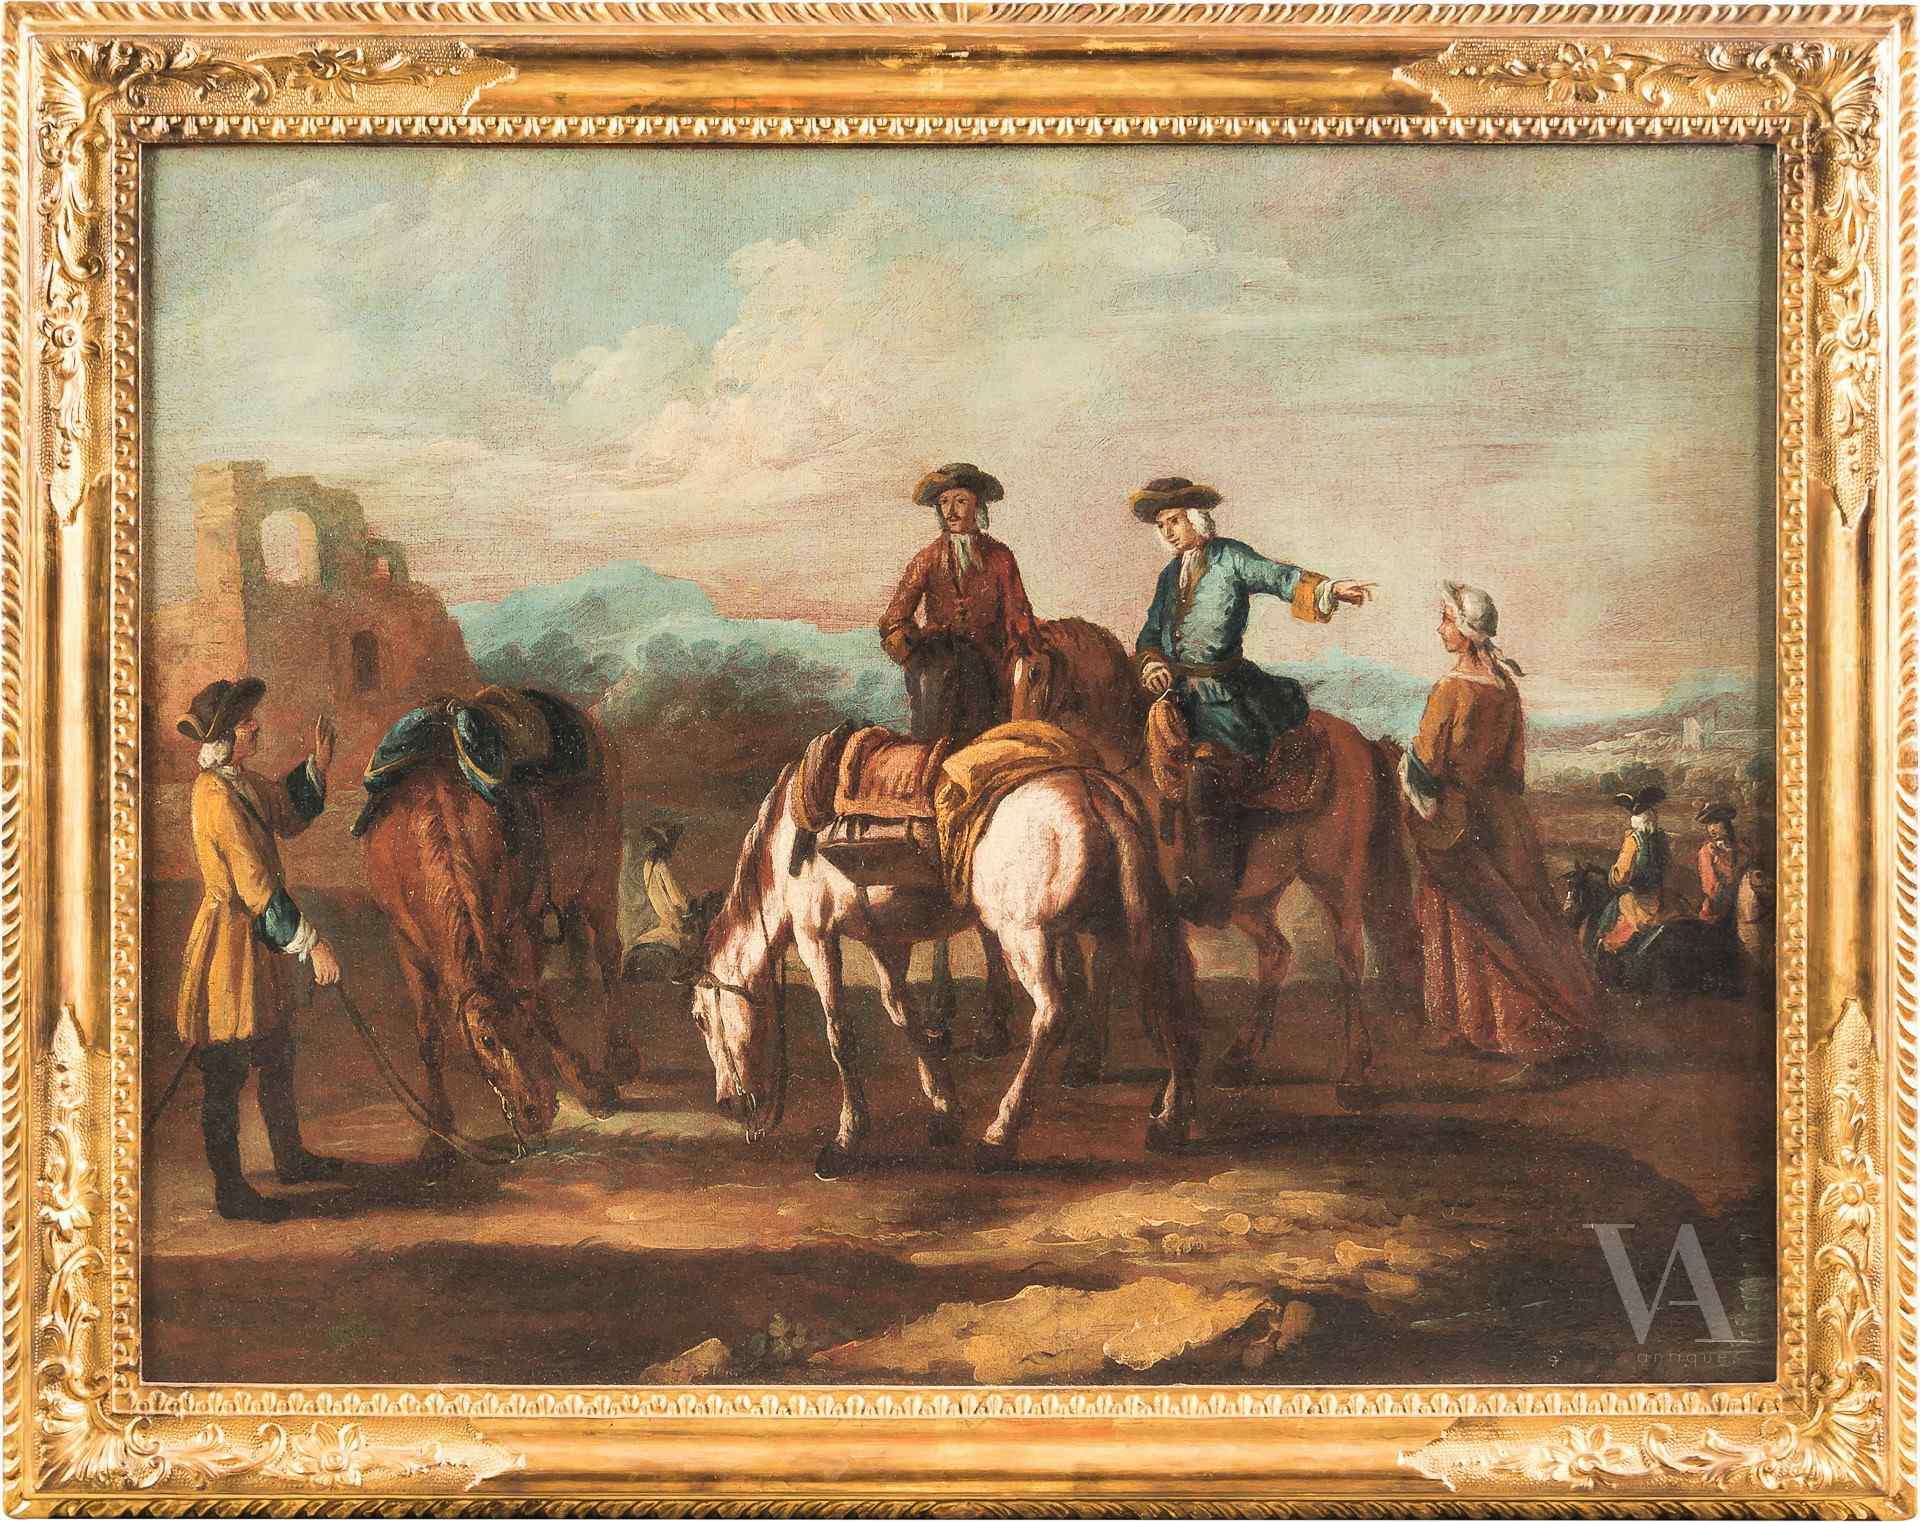 Giuseppe Zais, Cavalieri in sosta, XVIII sec.